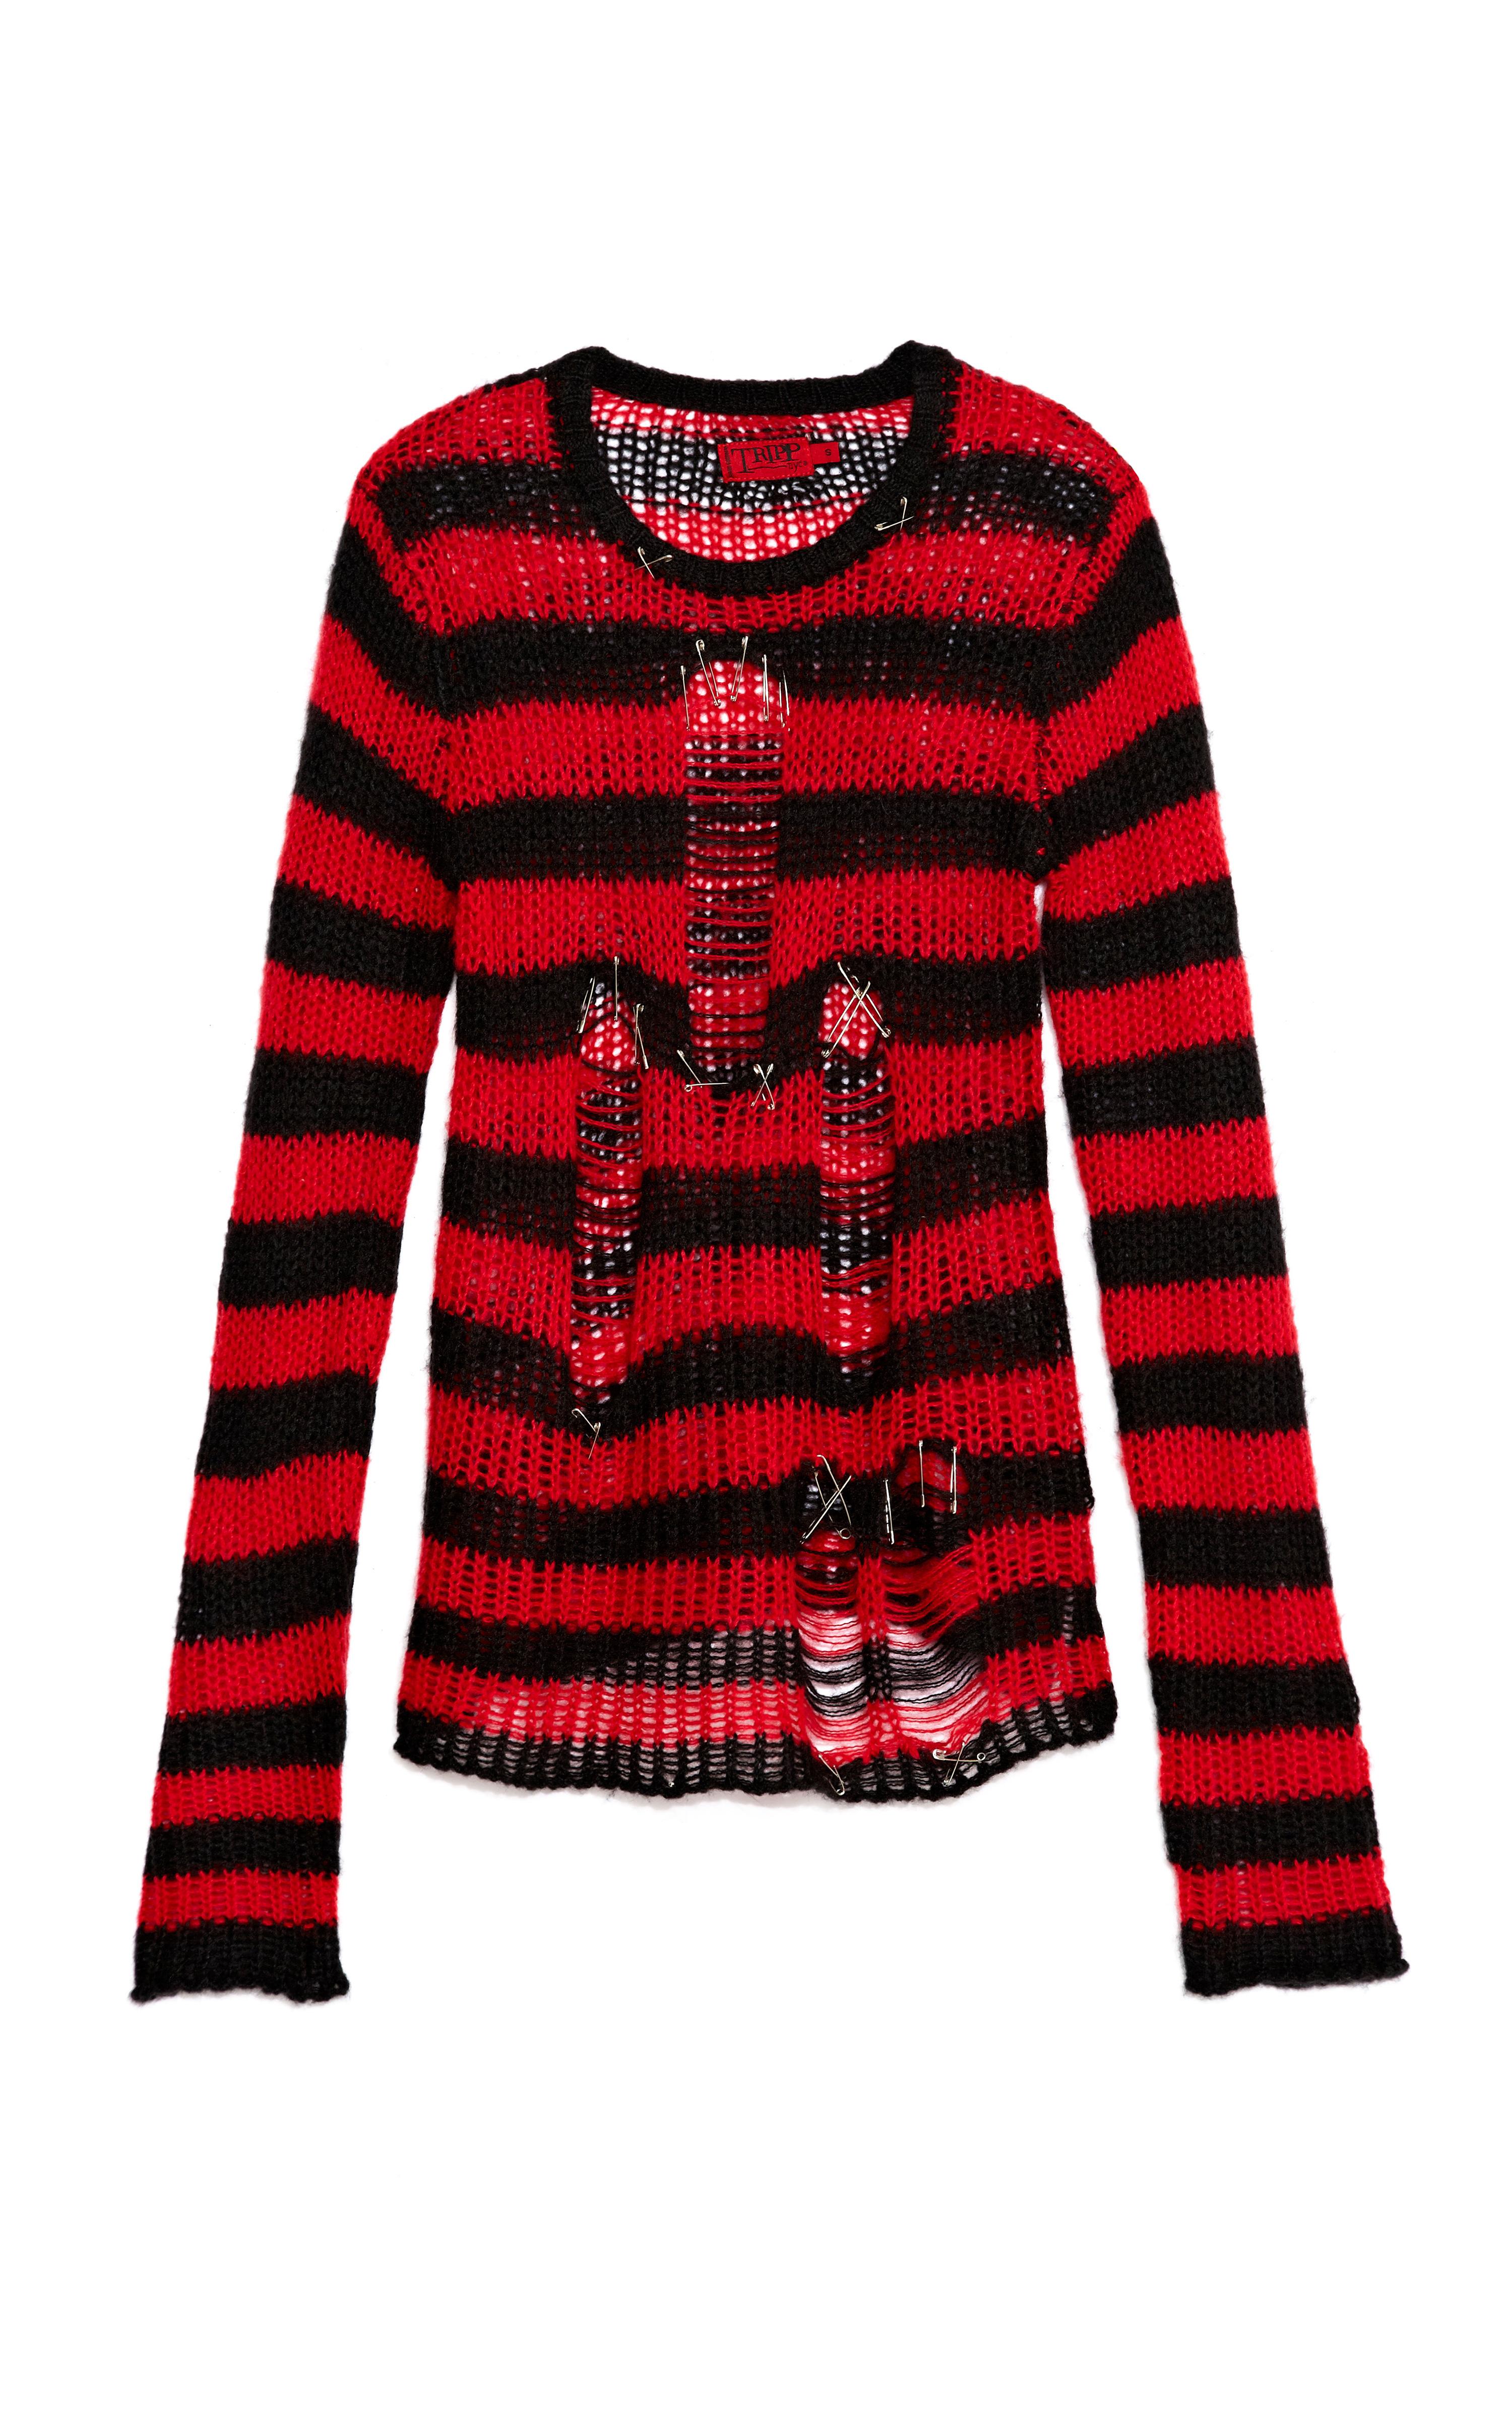 Free shipping and returns on Women's Red Sweaters at ajaykumarchejarla.ml